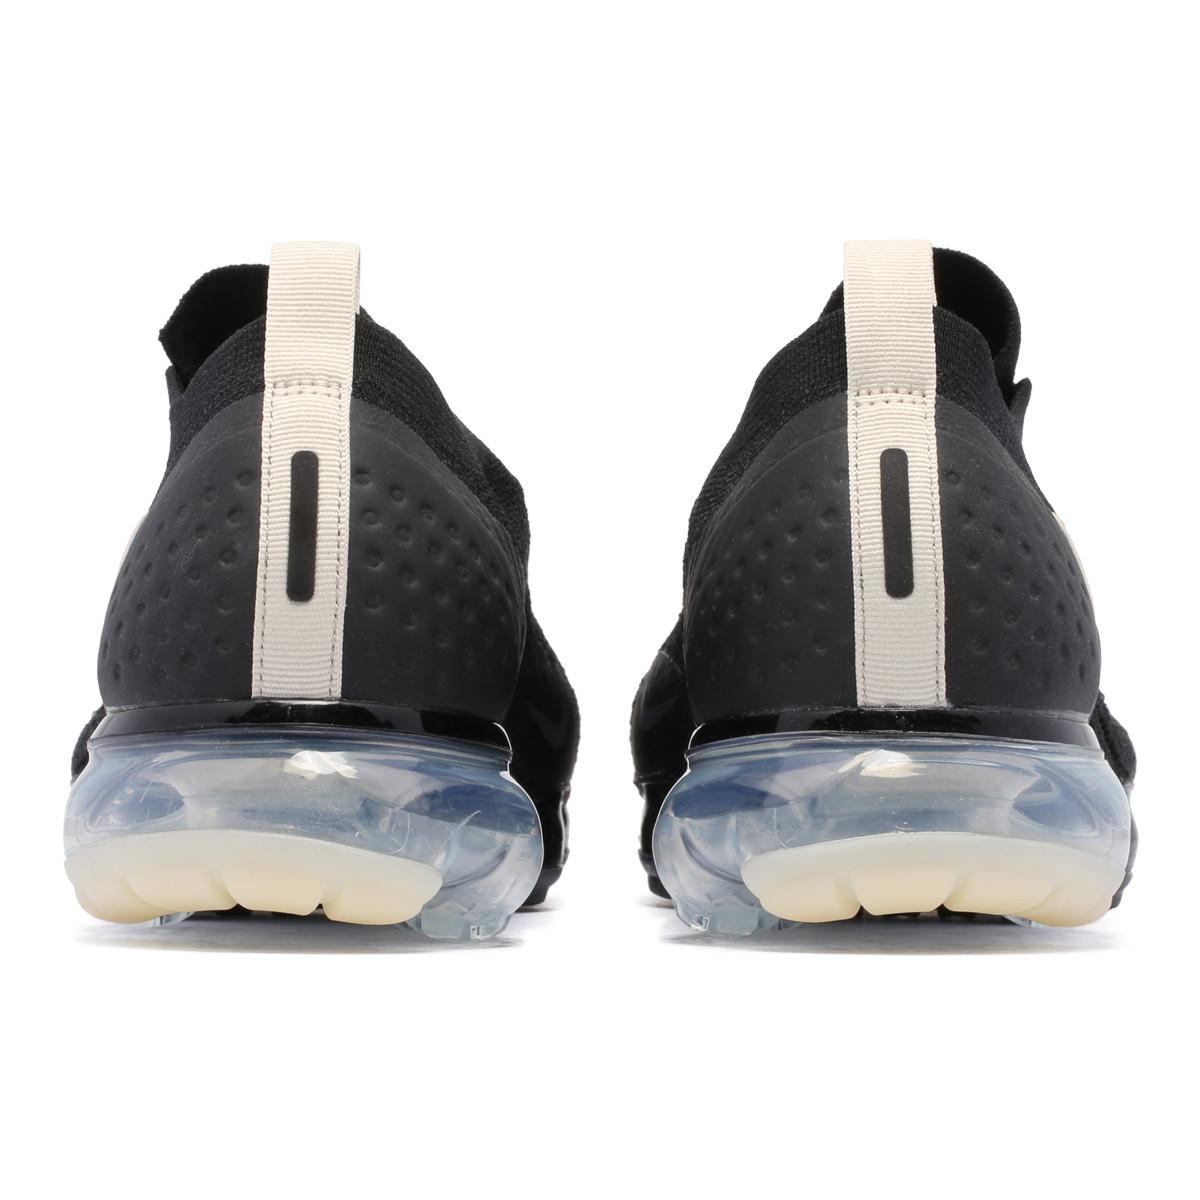 43a853171a4 Nike Air VaporMax Moc 2 (Black  Light Cream  White Thunder Grey) Men